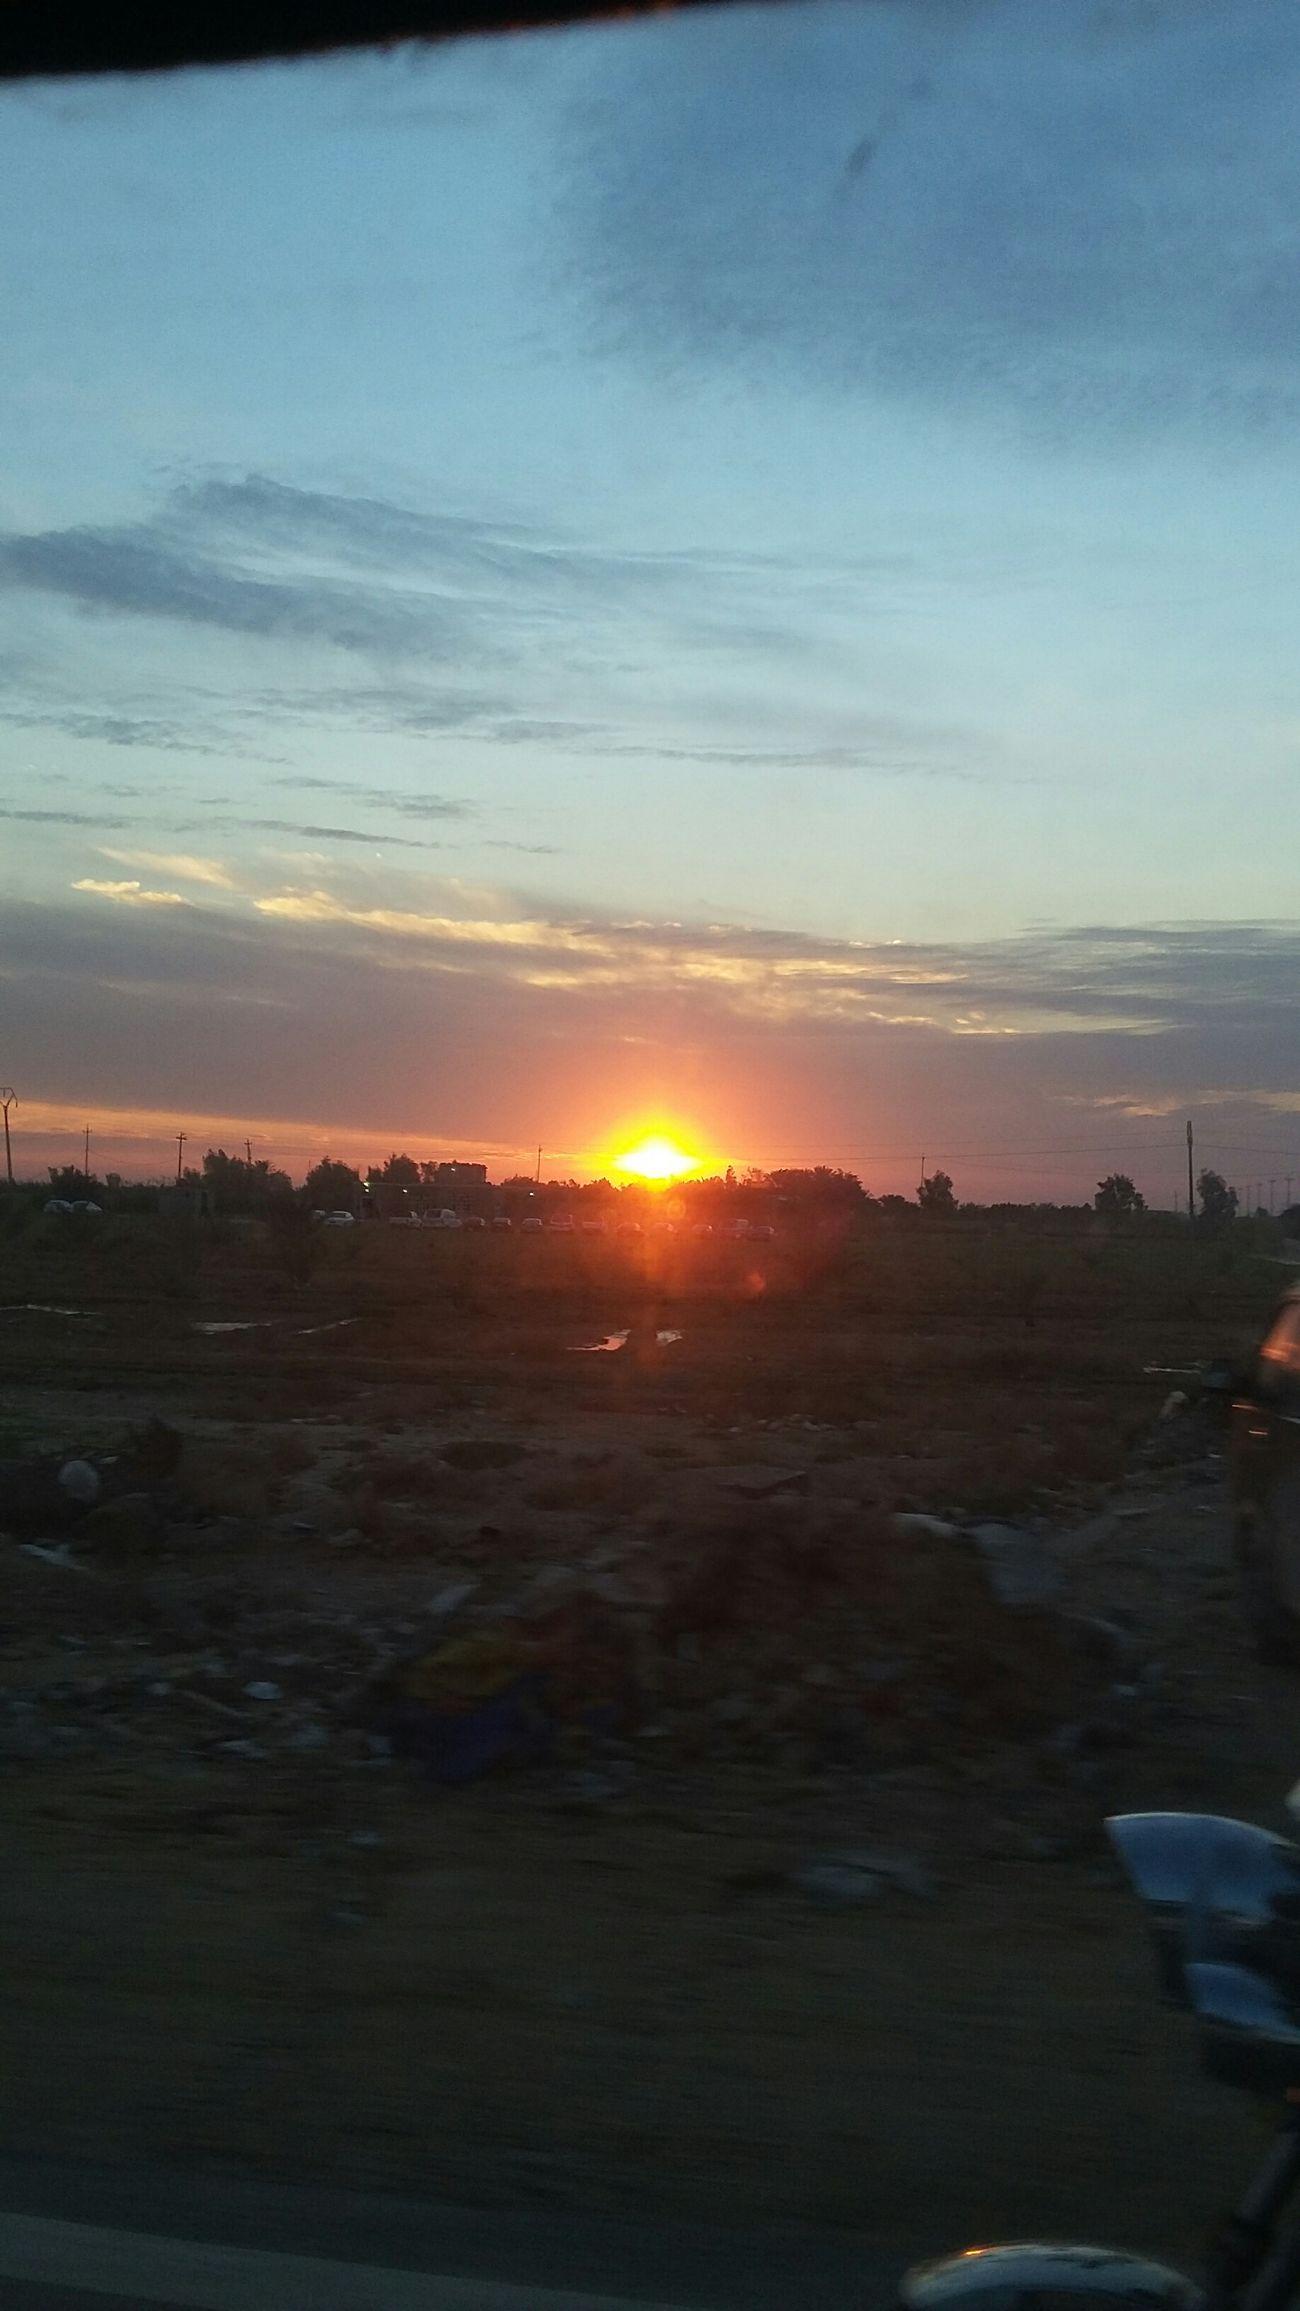 Human Vs Nature Sunset Clean Shot